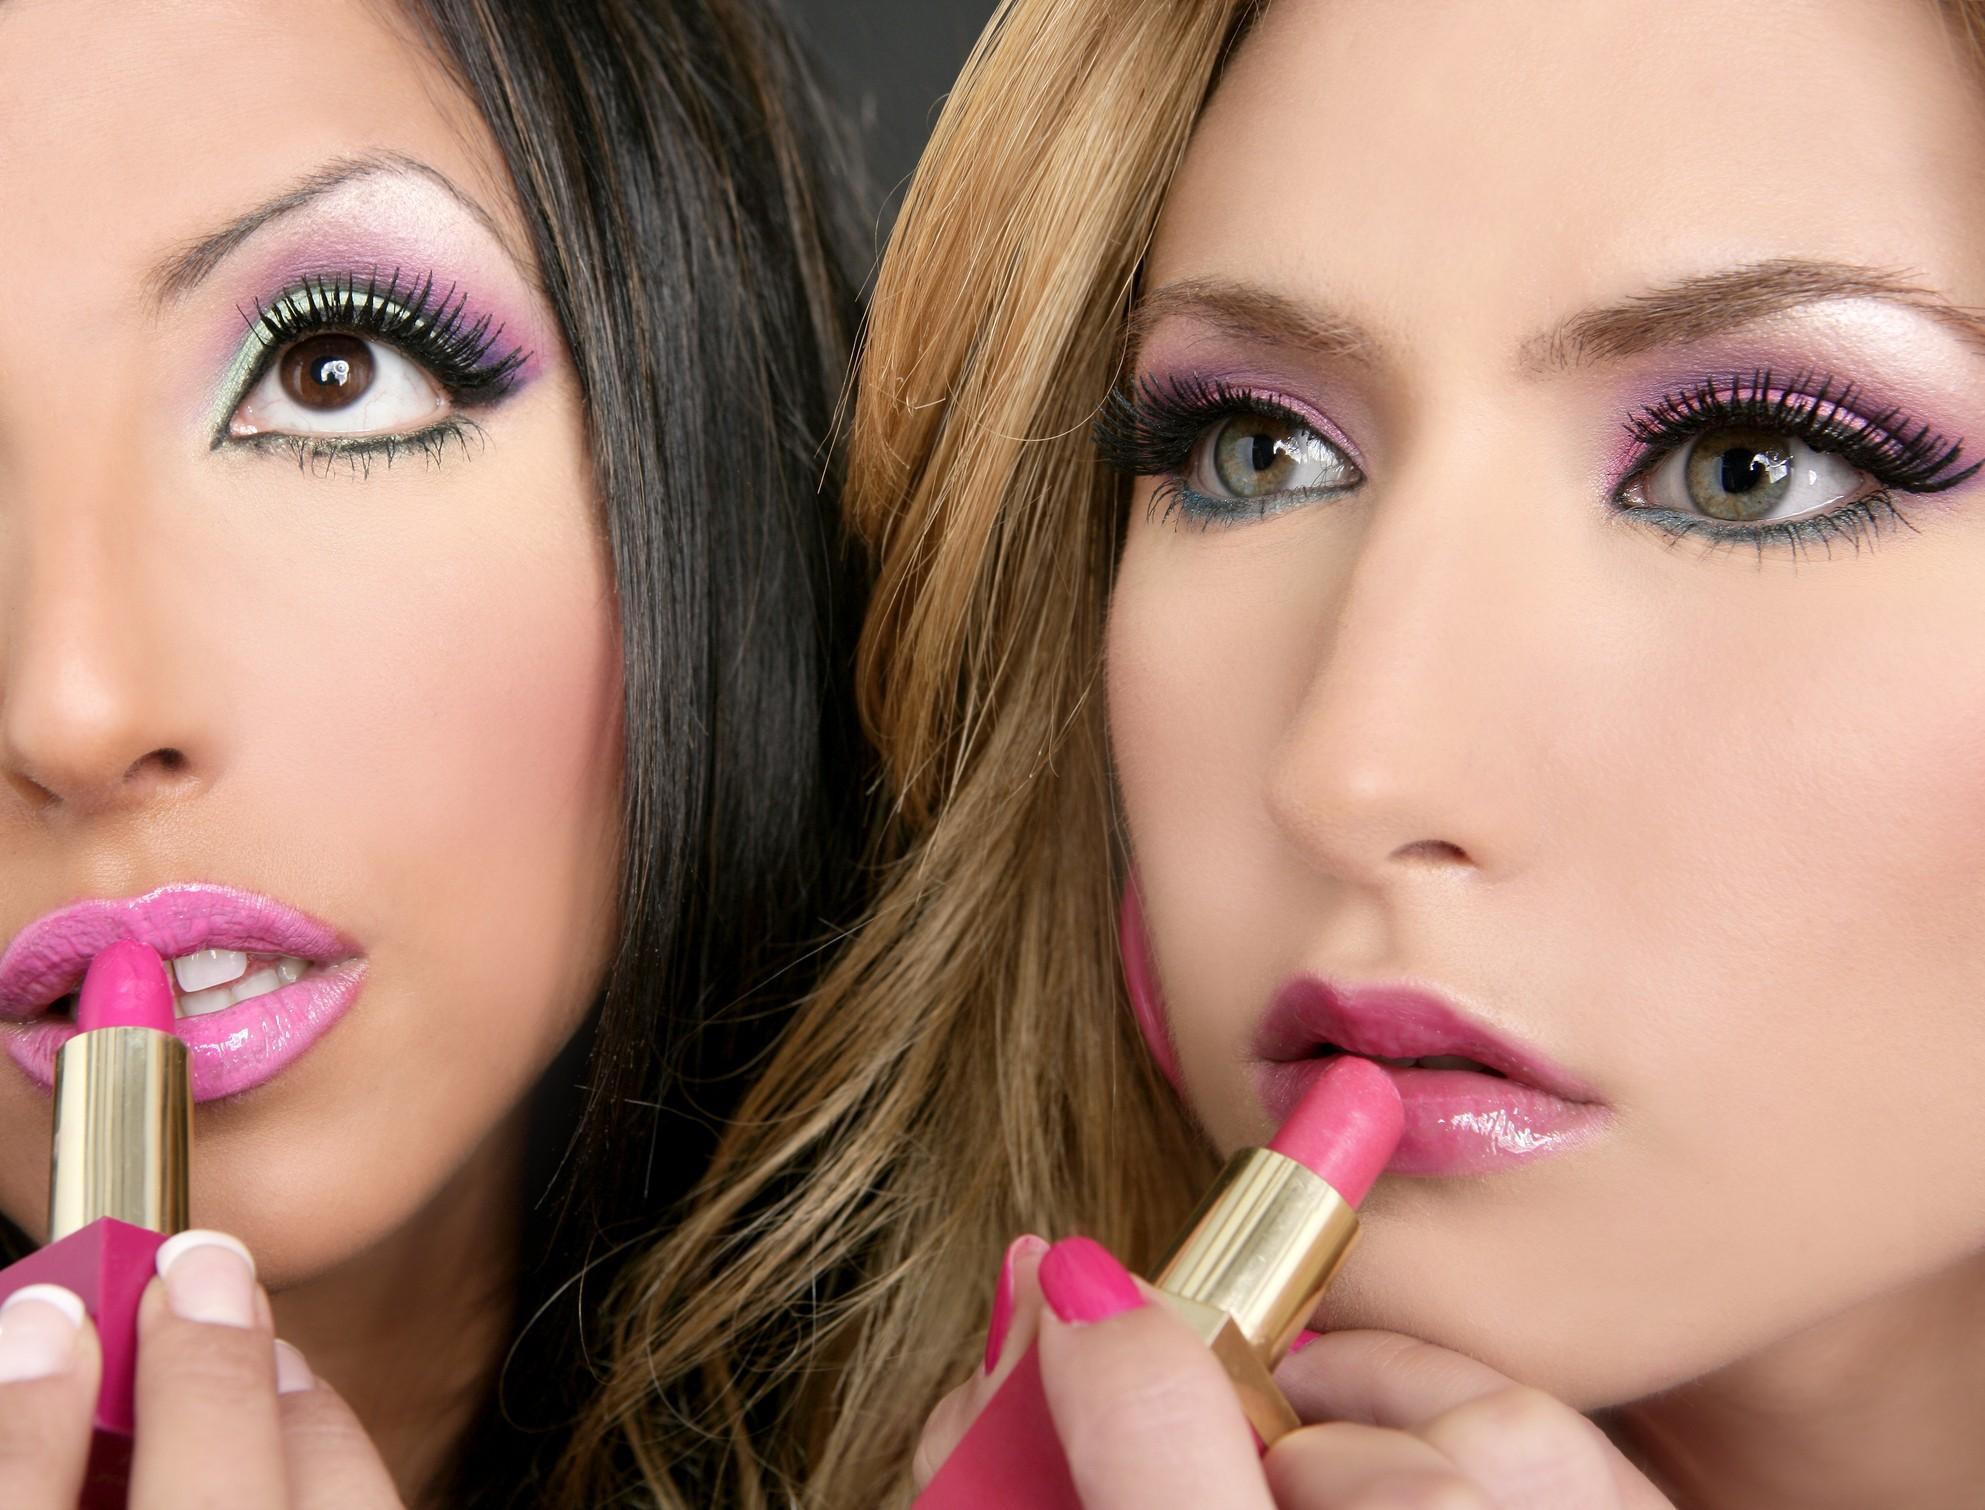 two women in heavy makeup applying lipstick